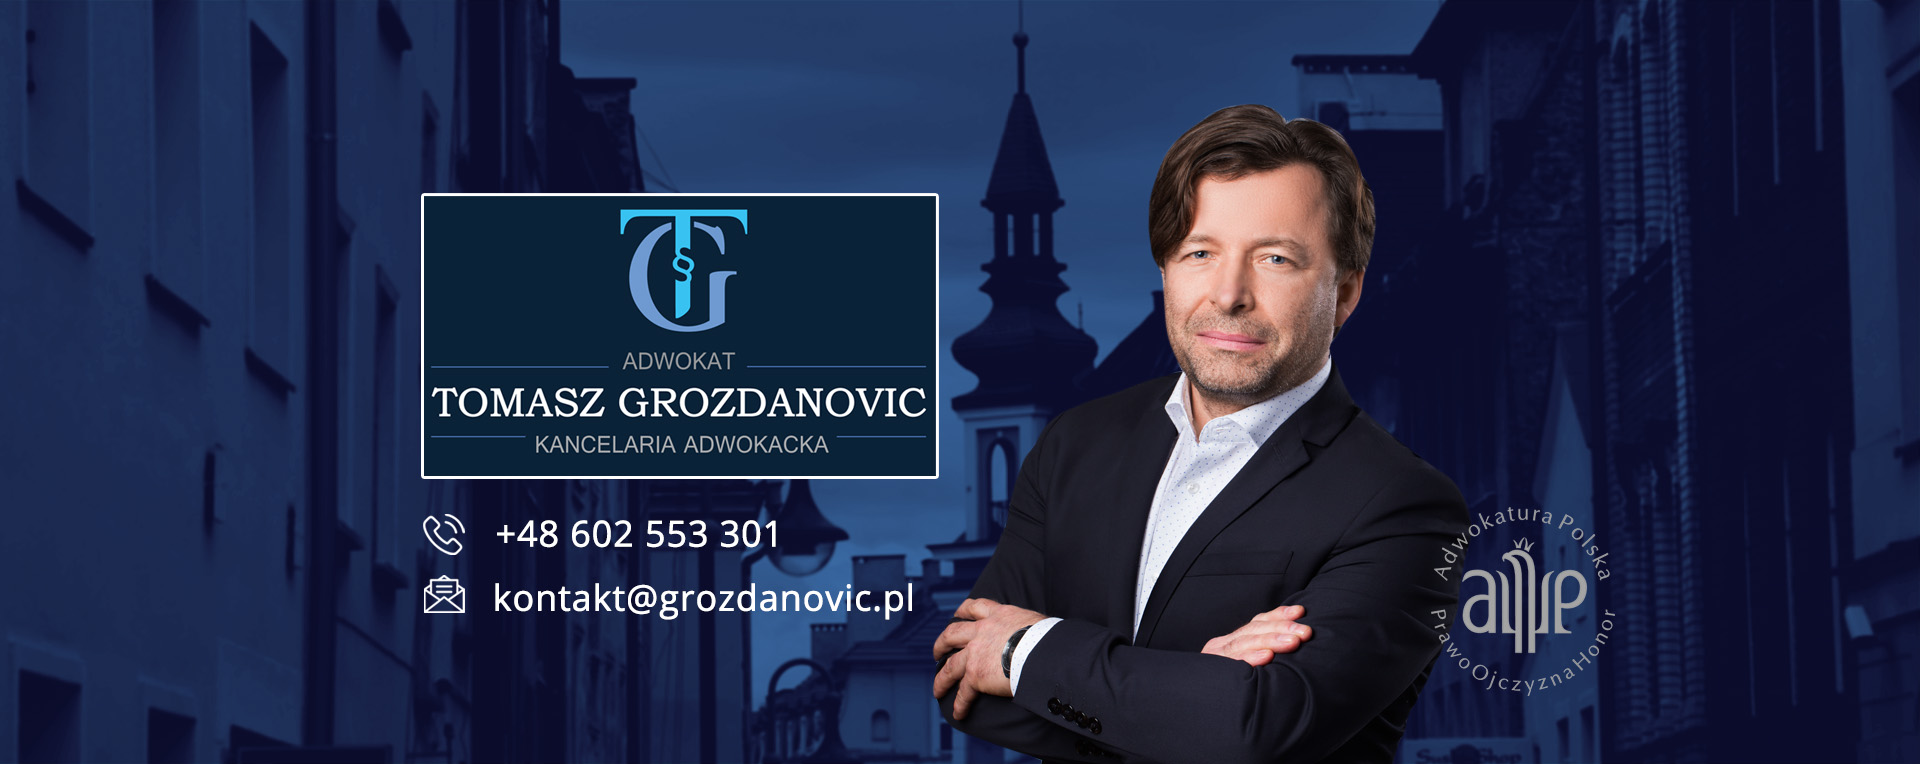 Adwokat Opole Tomasz Grozdanovic